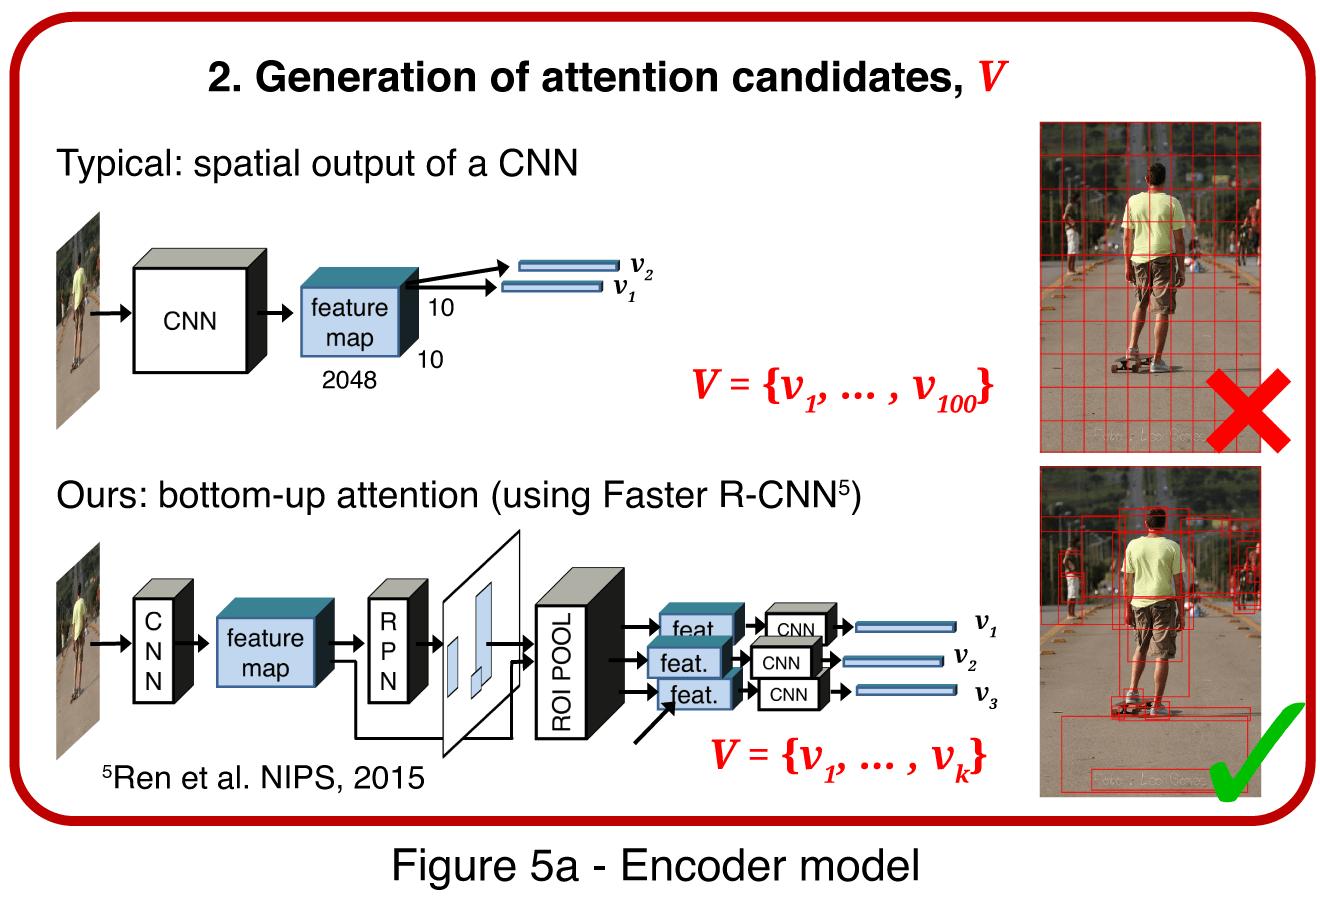 Faster R-CNN model for image annotation